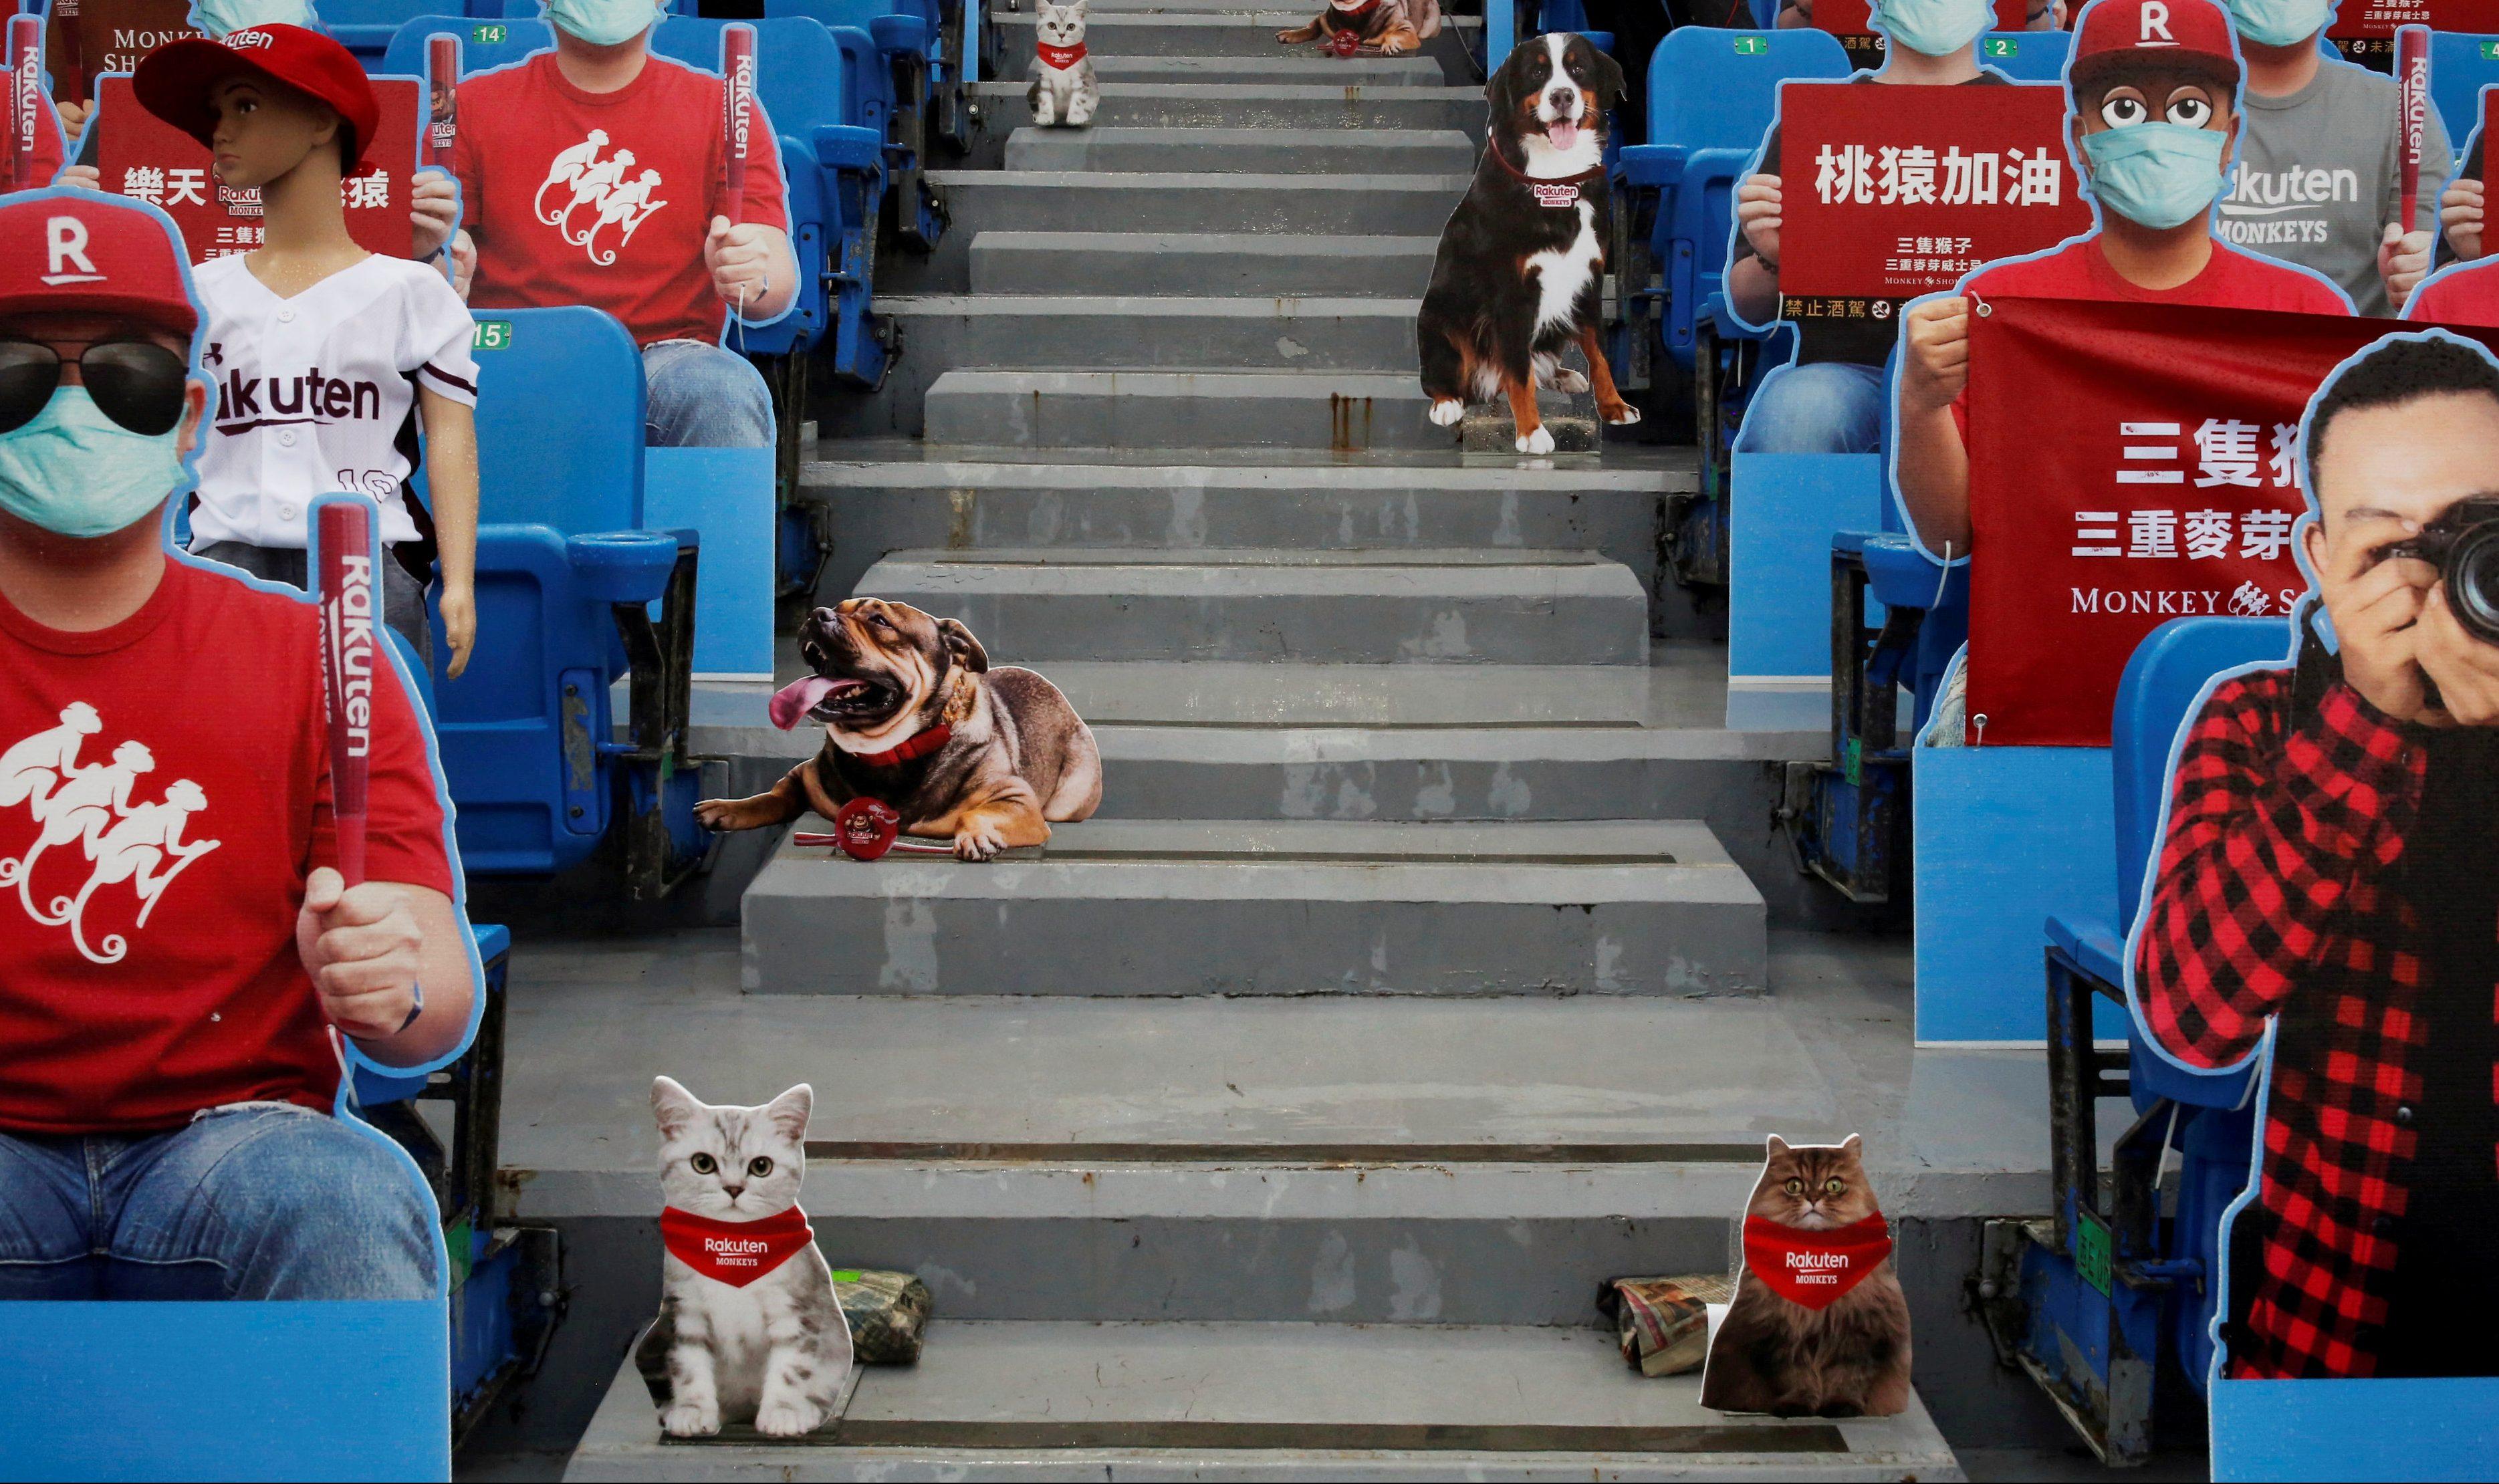 Baseball fans turn to Taiwan pro league for entertainment — Quartz